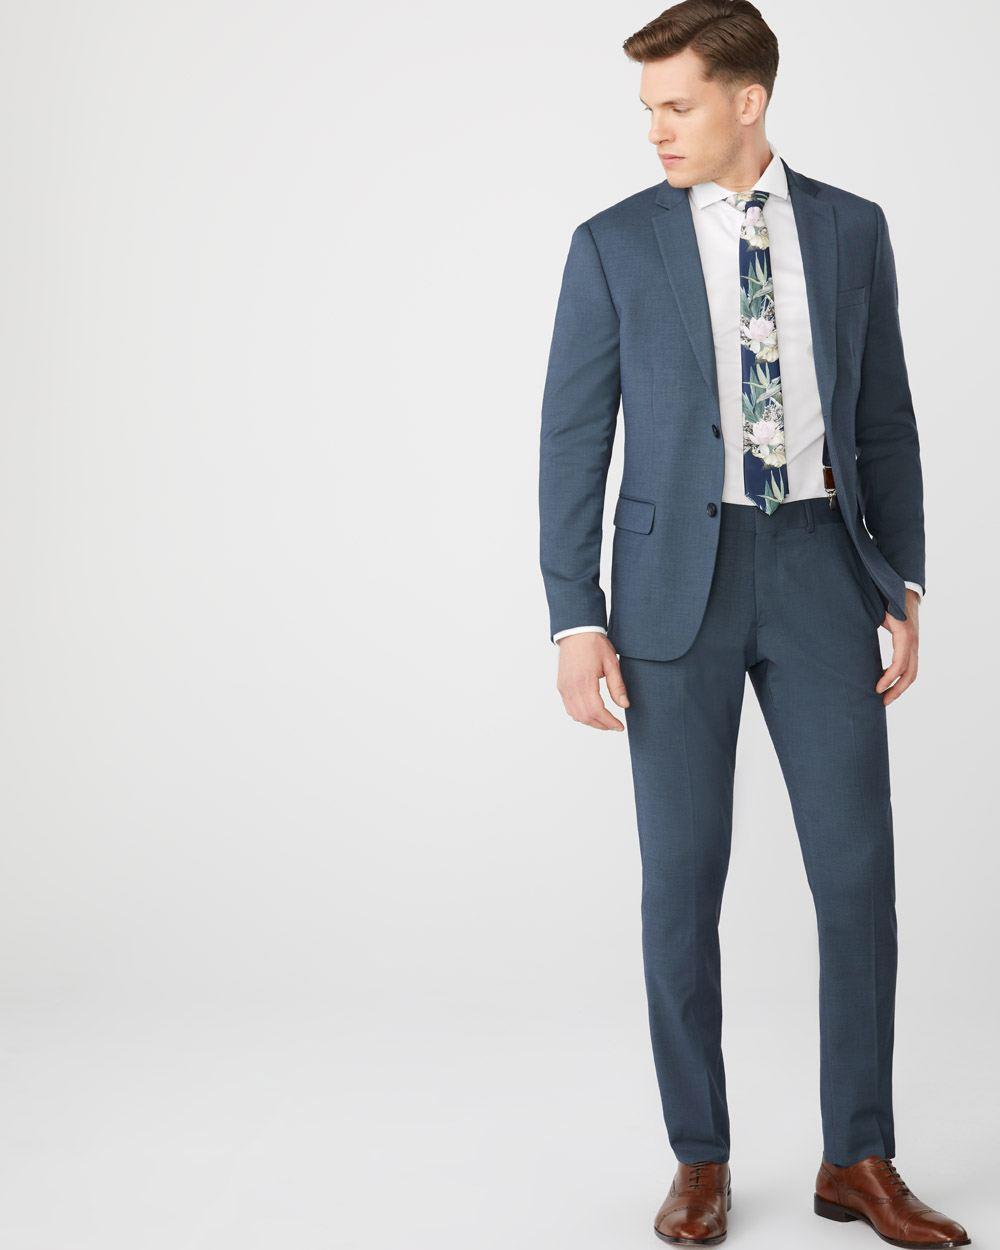 5b11f17f4a Slim Fit Coolmax (TM) Teal blue suit blazer | RW&CO.